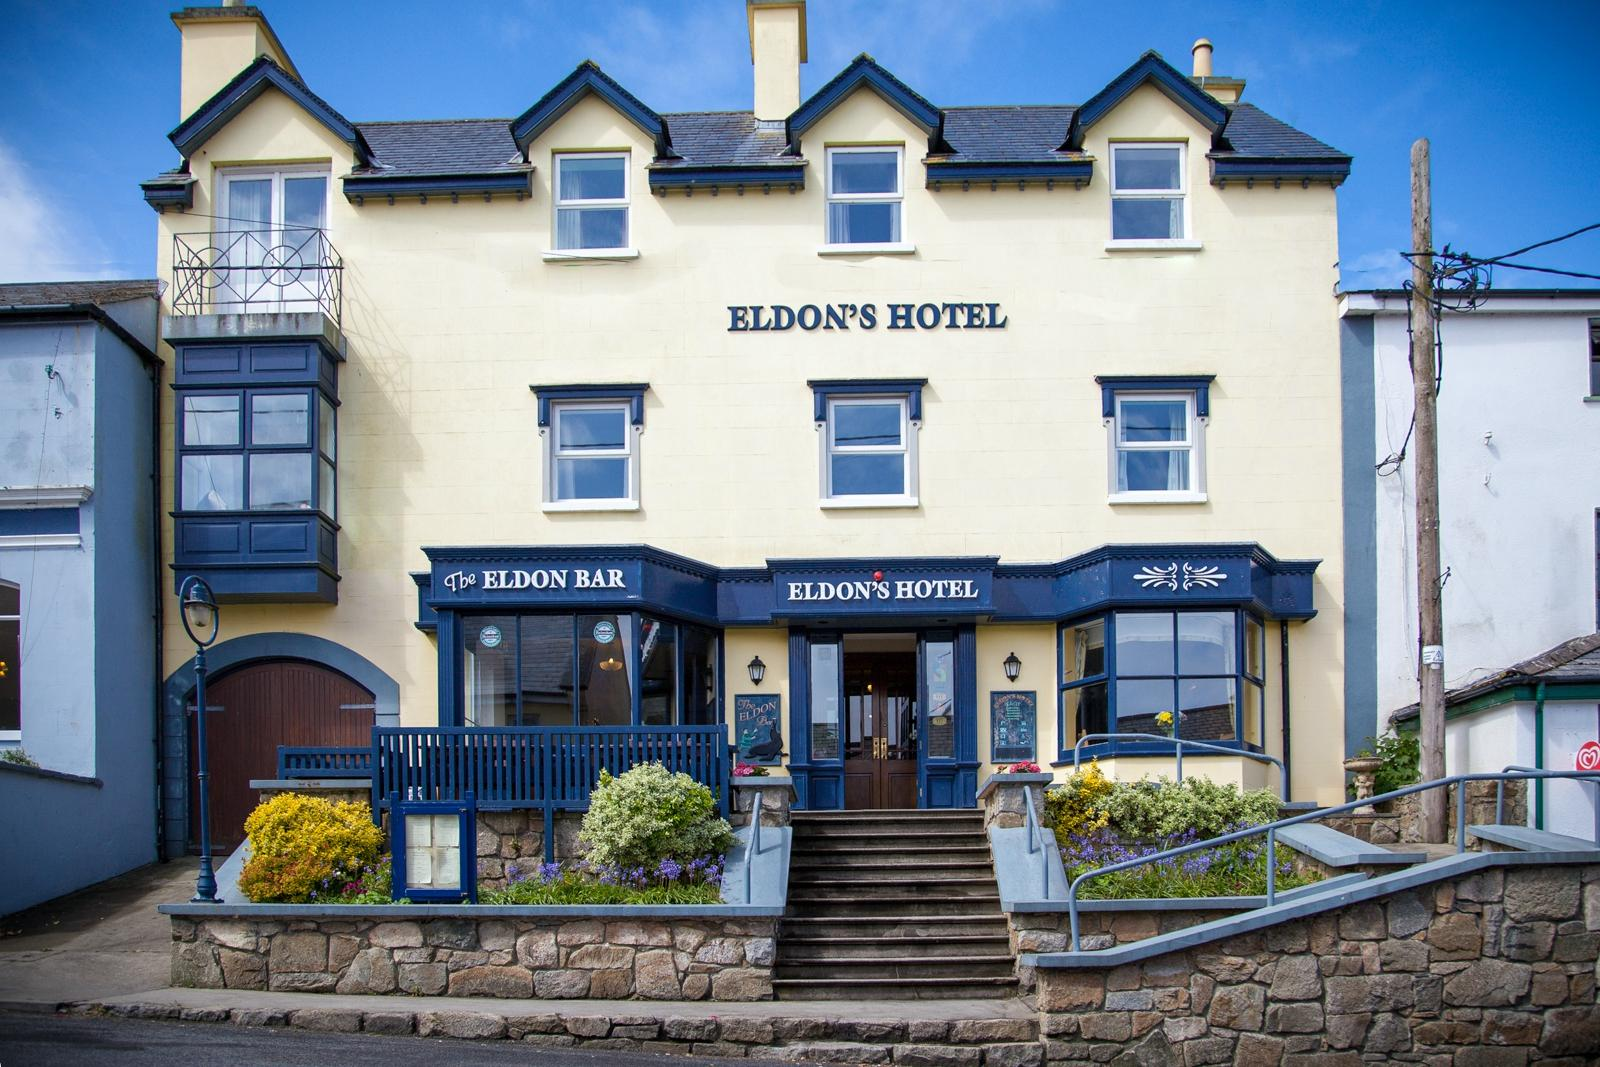 Eldons Hotel & Resturant